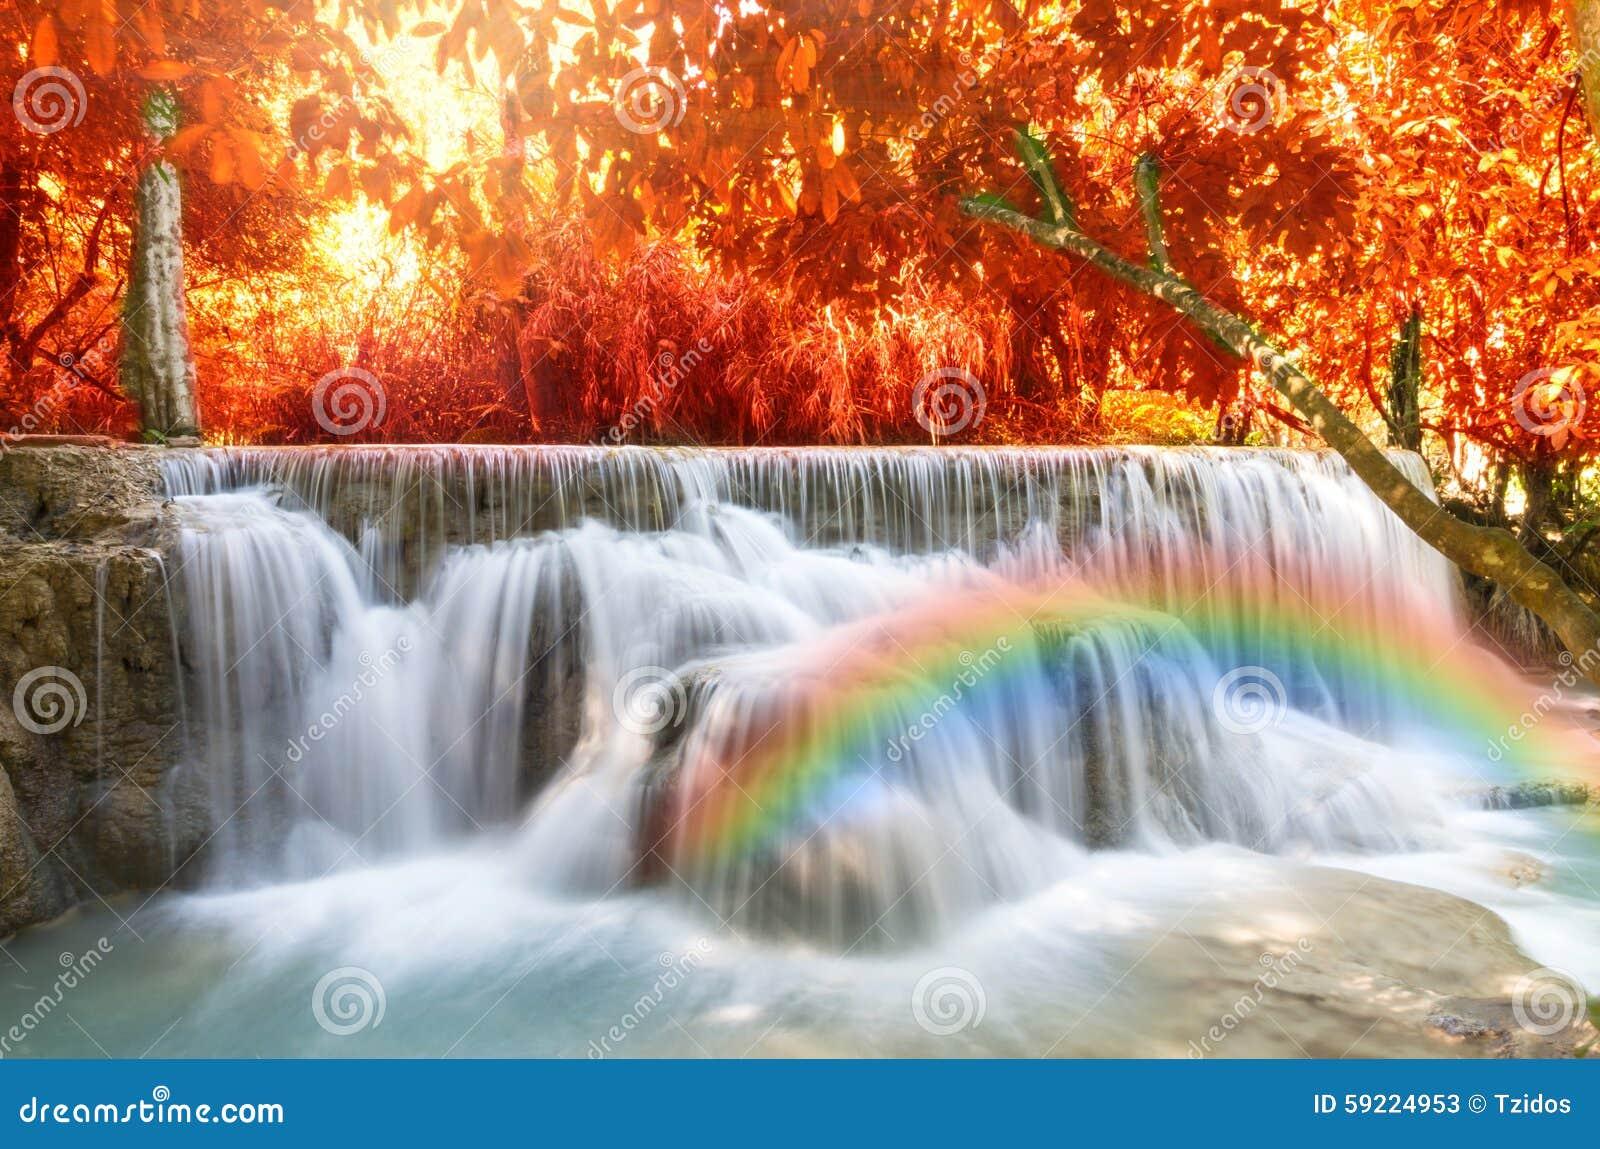 beautiful soft waterfall in - photo #28